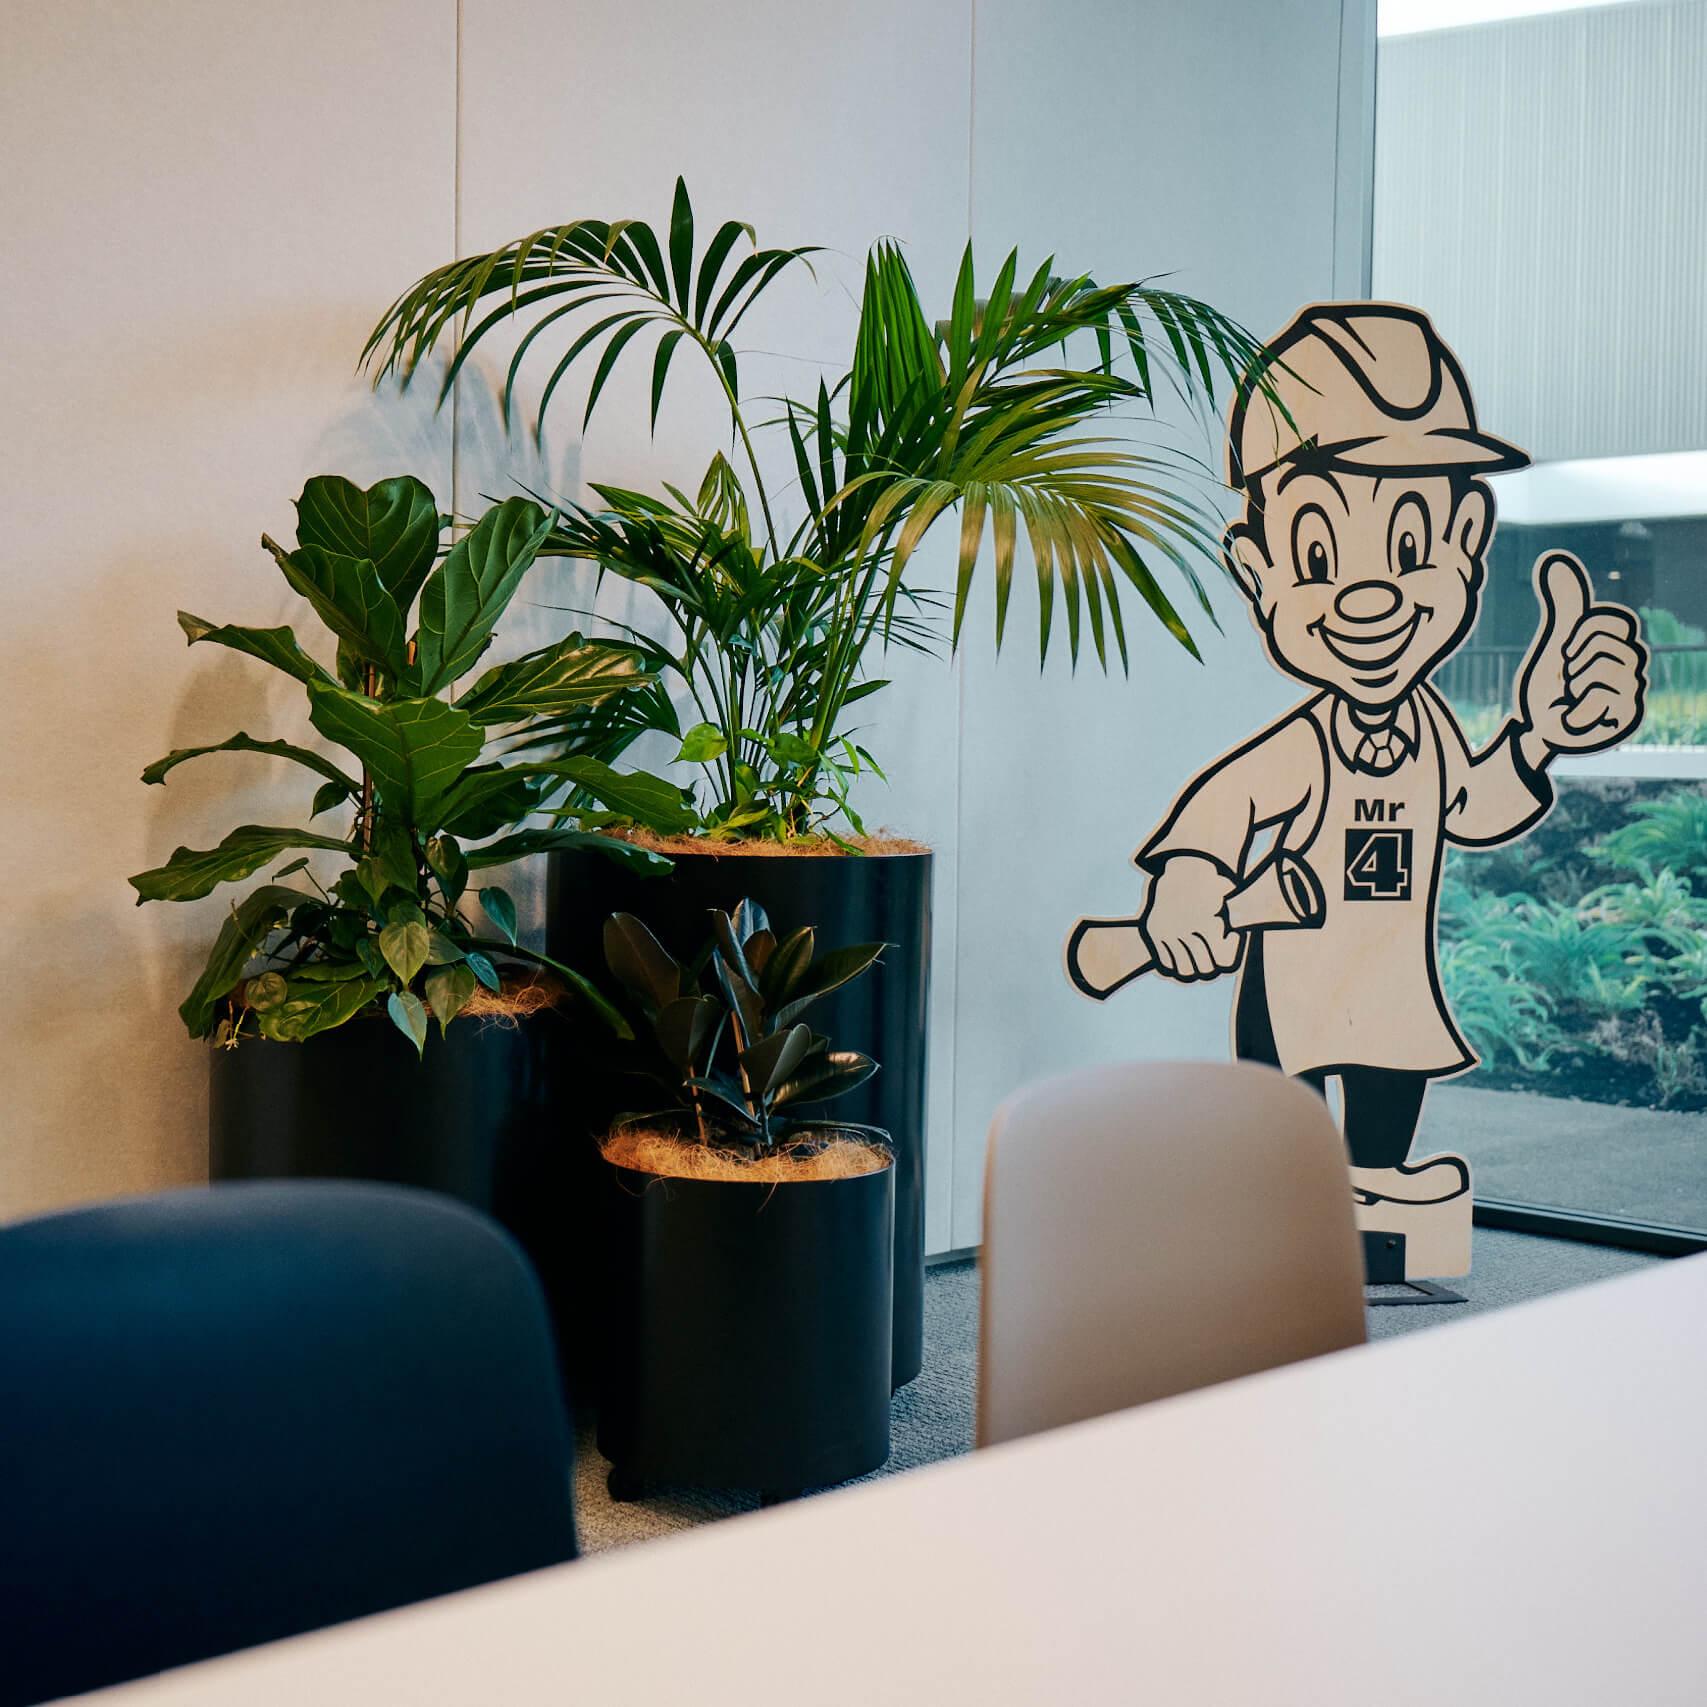 portfolio-offices-spaces-foodstuffs-image3